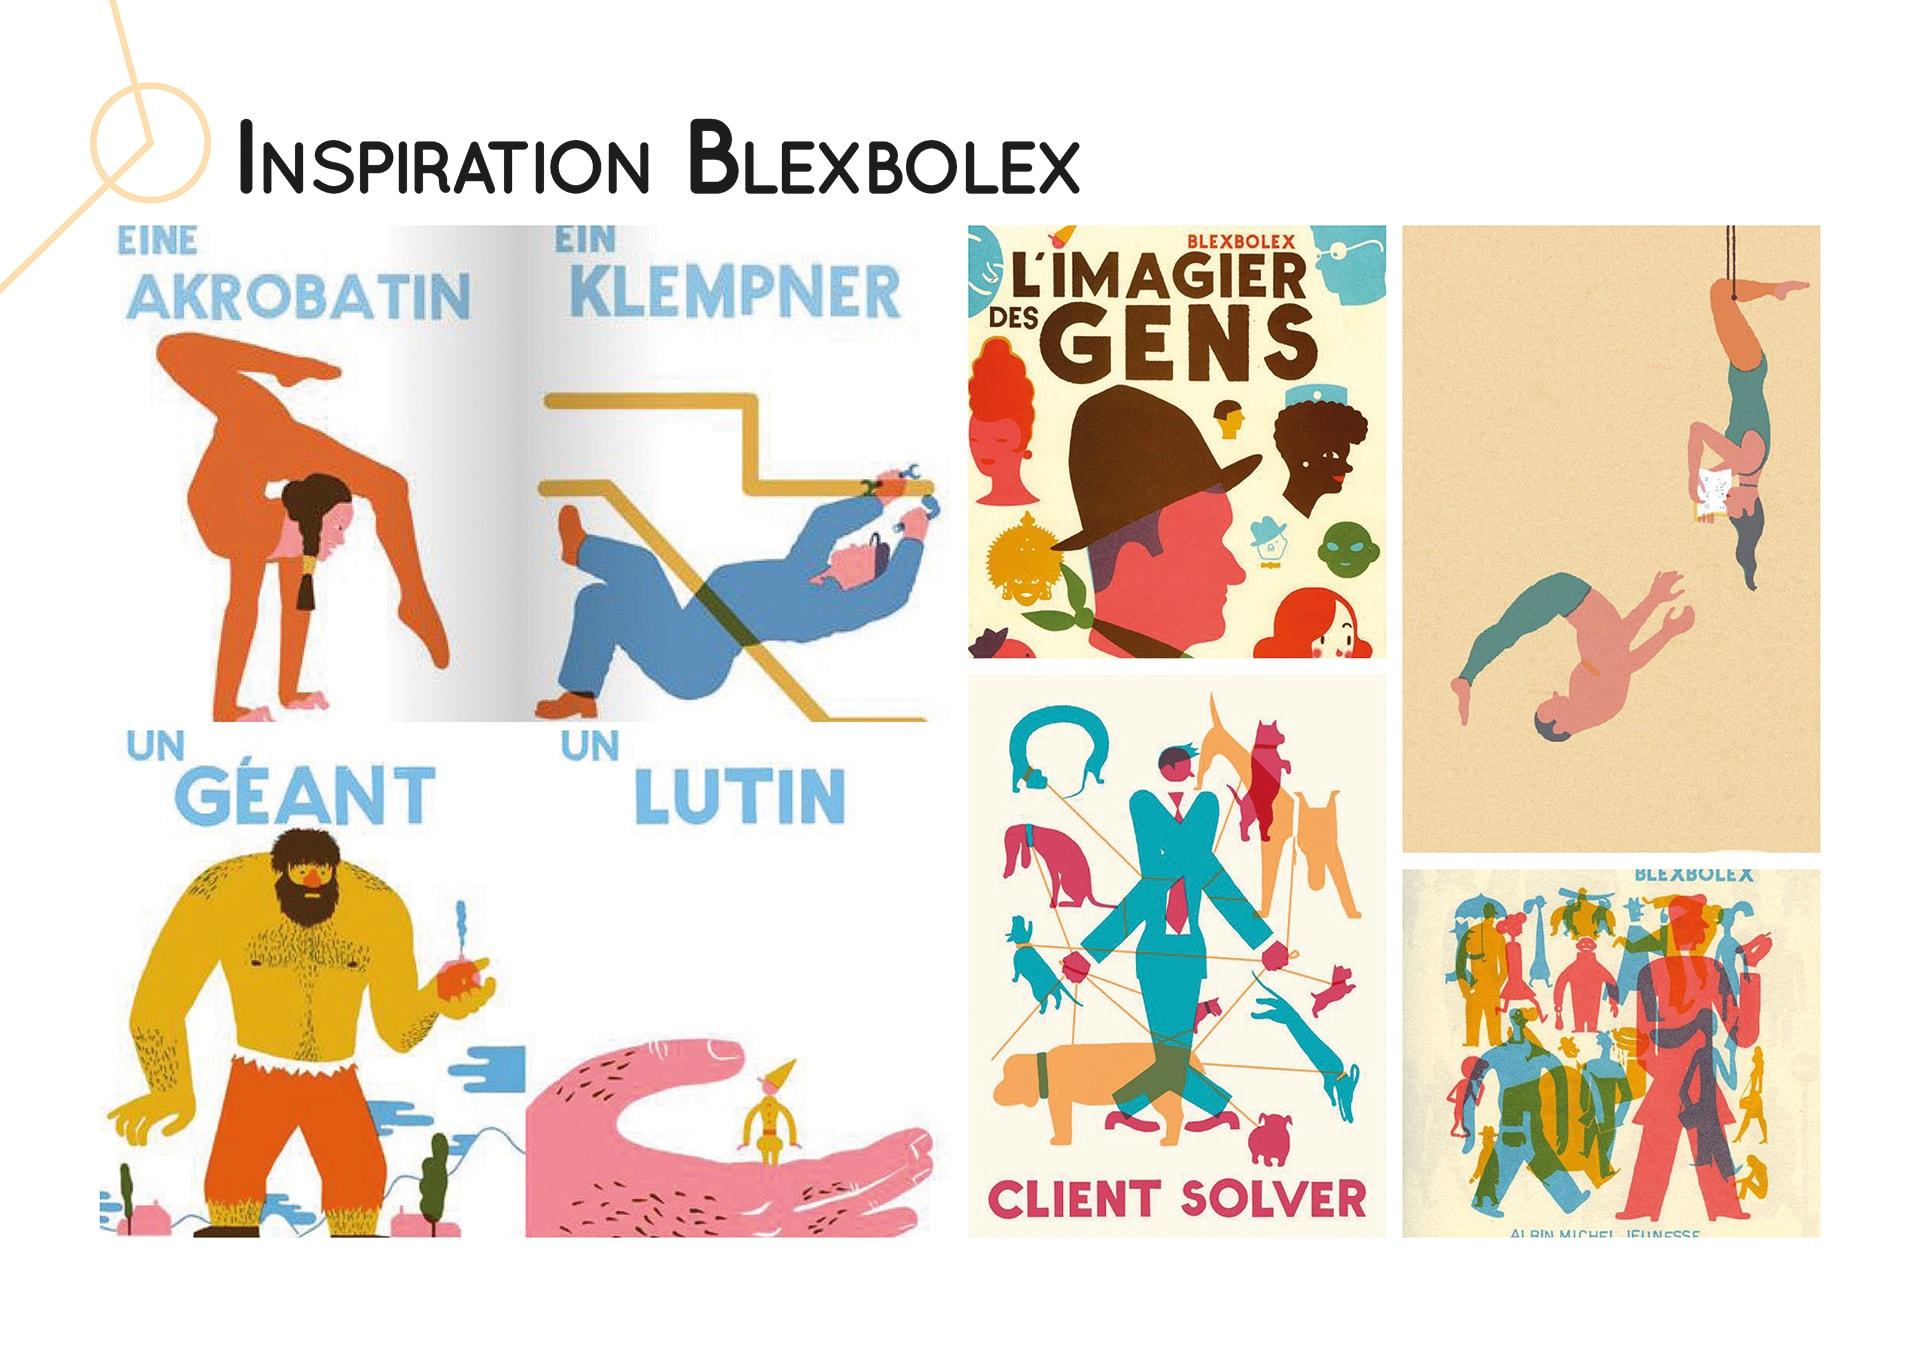 Inspiration Blexbolex